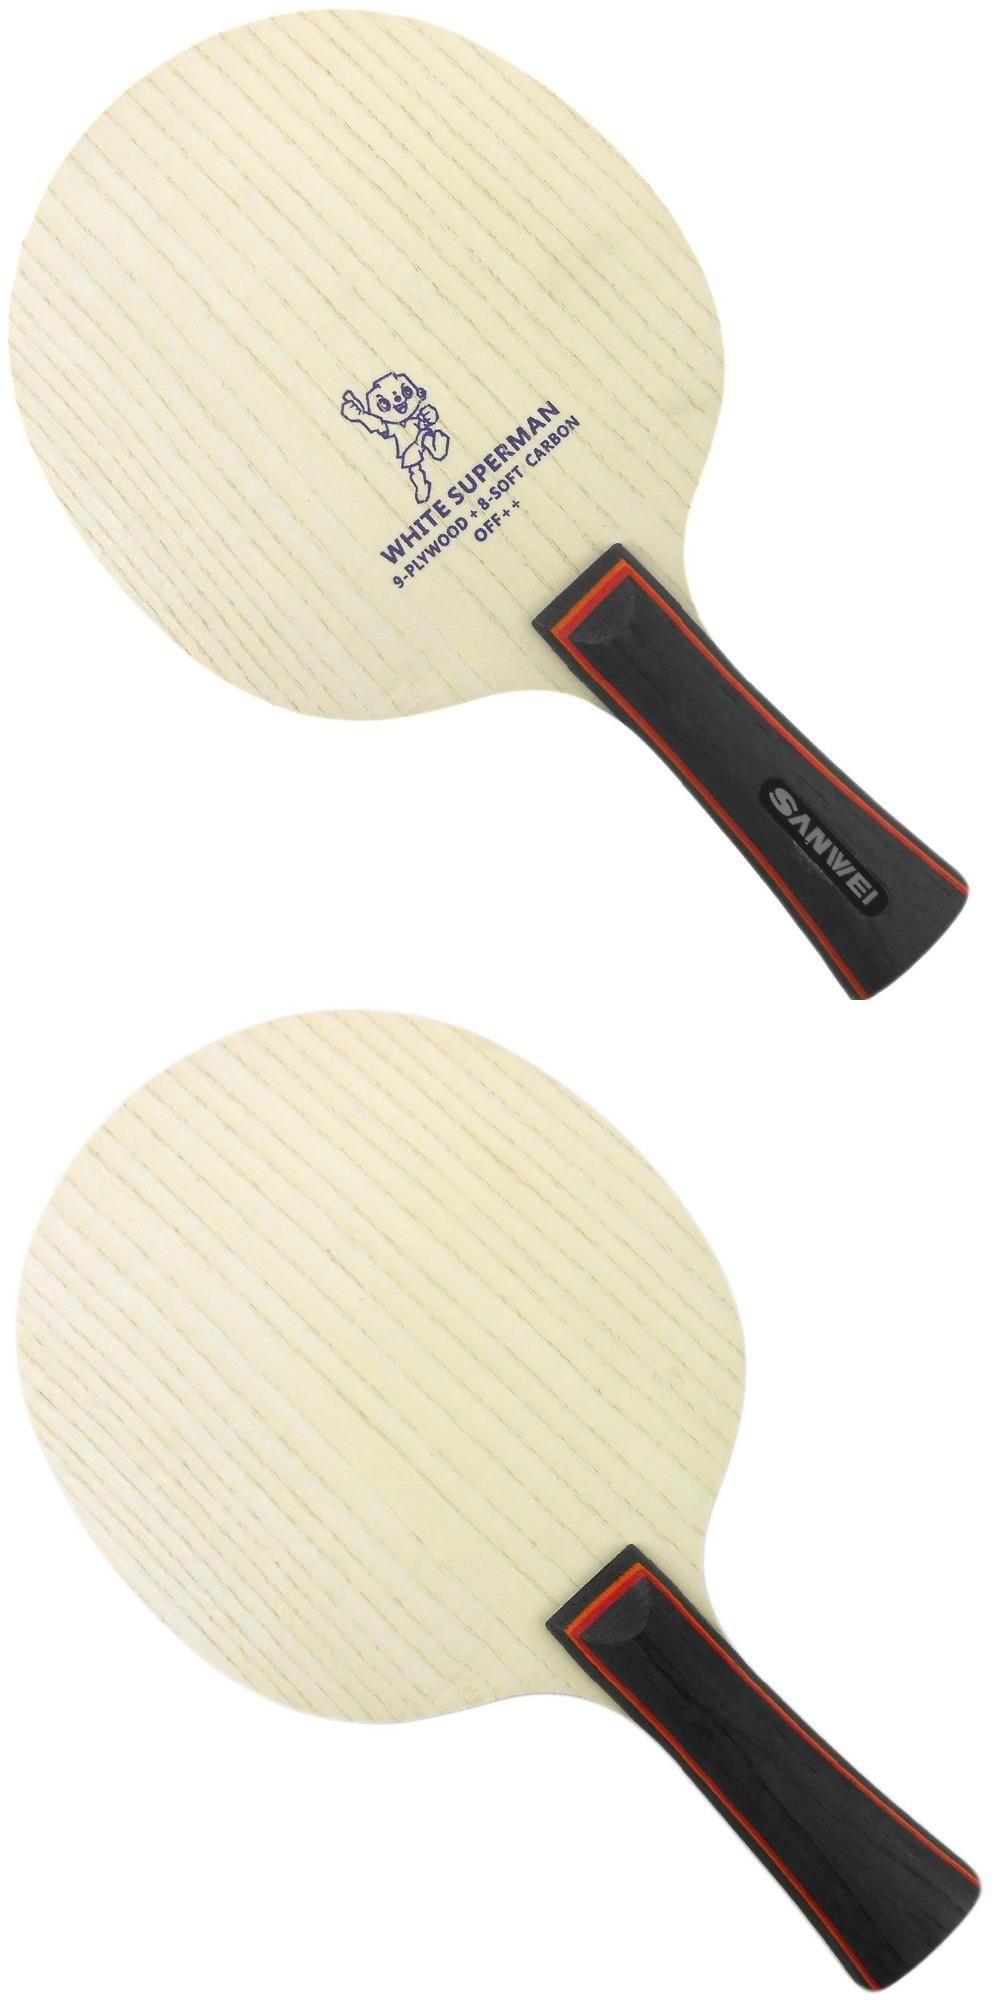 Visit To Buy Sanwei B2 White Superman B 2 B 2 Table Tennis Pingpong Blade Advertisement Table Tennis Table Tennis Racket Ping Pong